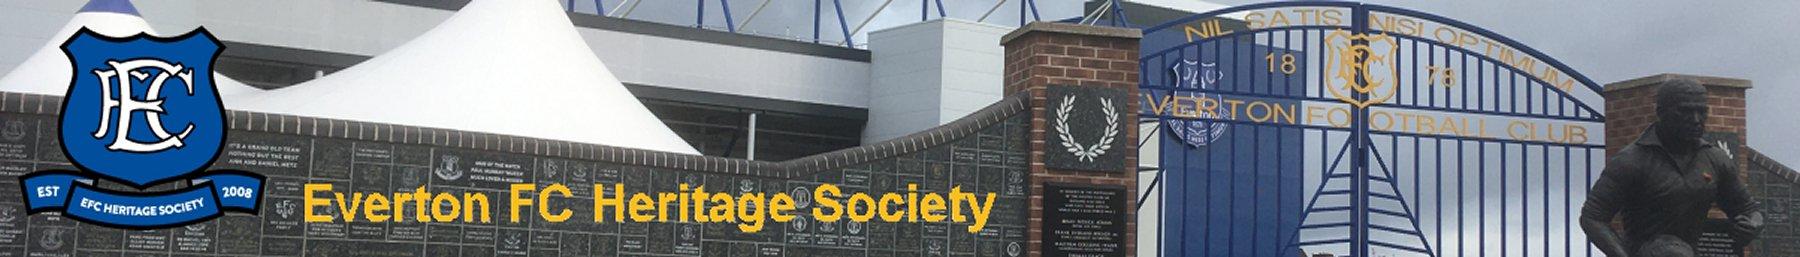 Everton FC Heritage Society